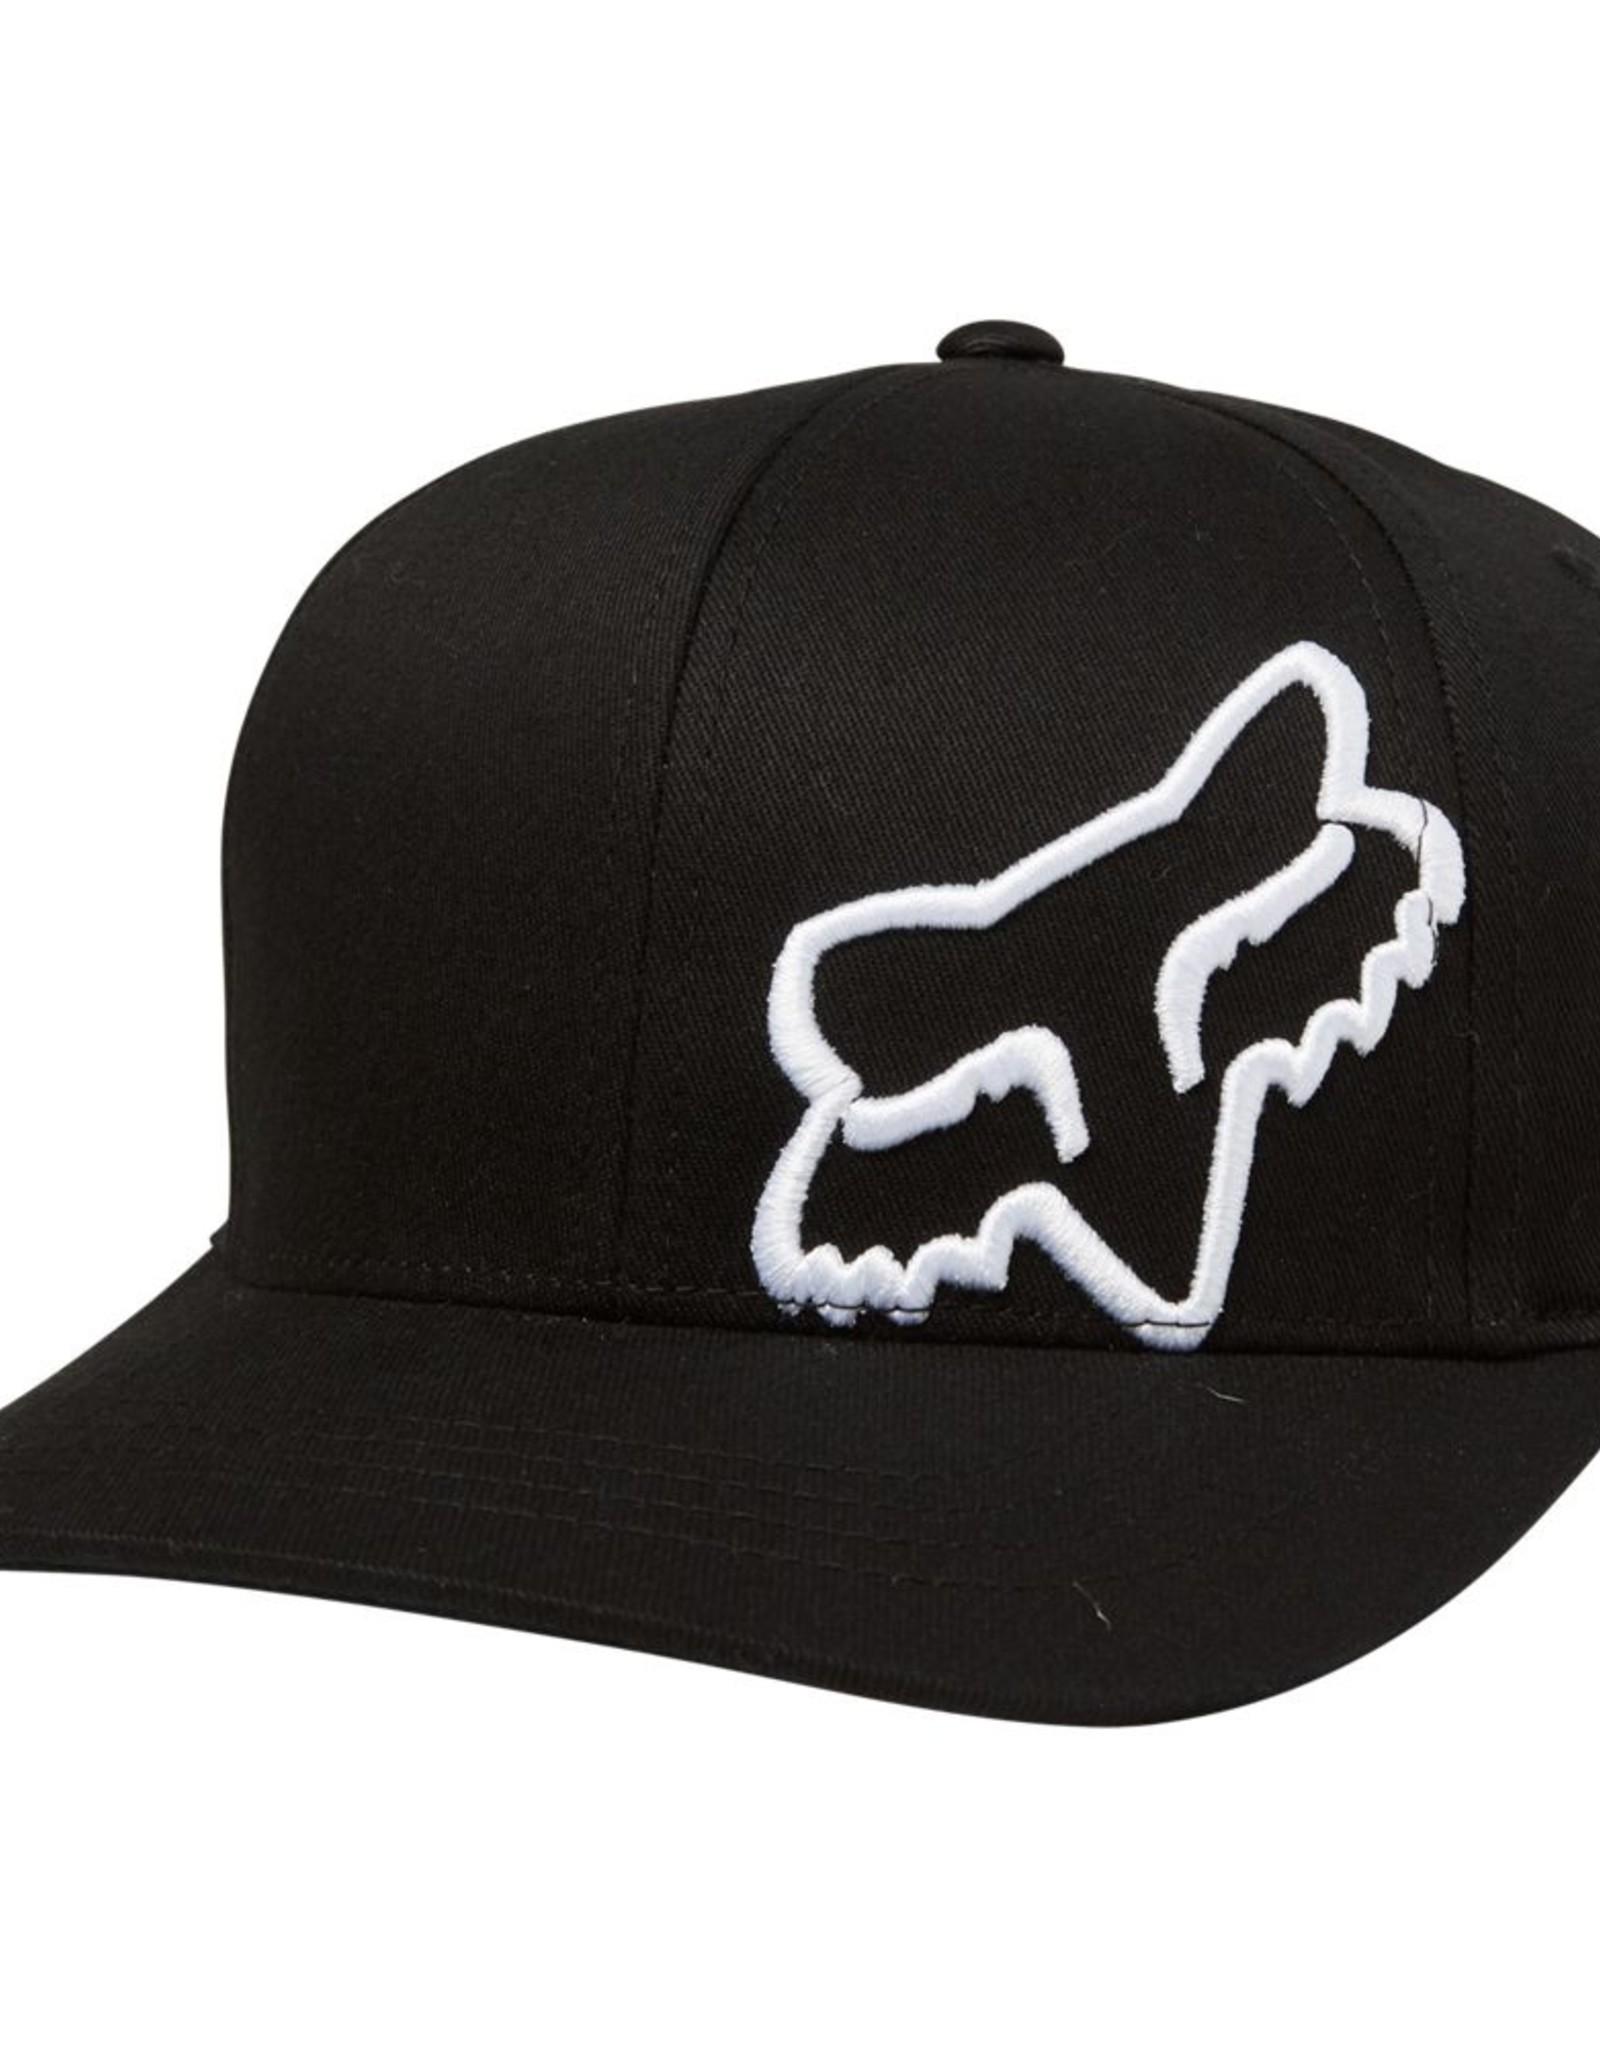 FOX FA21 Blk/Wht Flex 45 Hat 6Y+